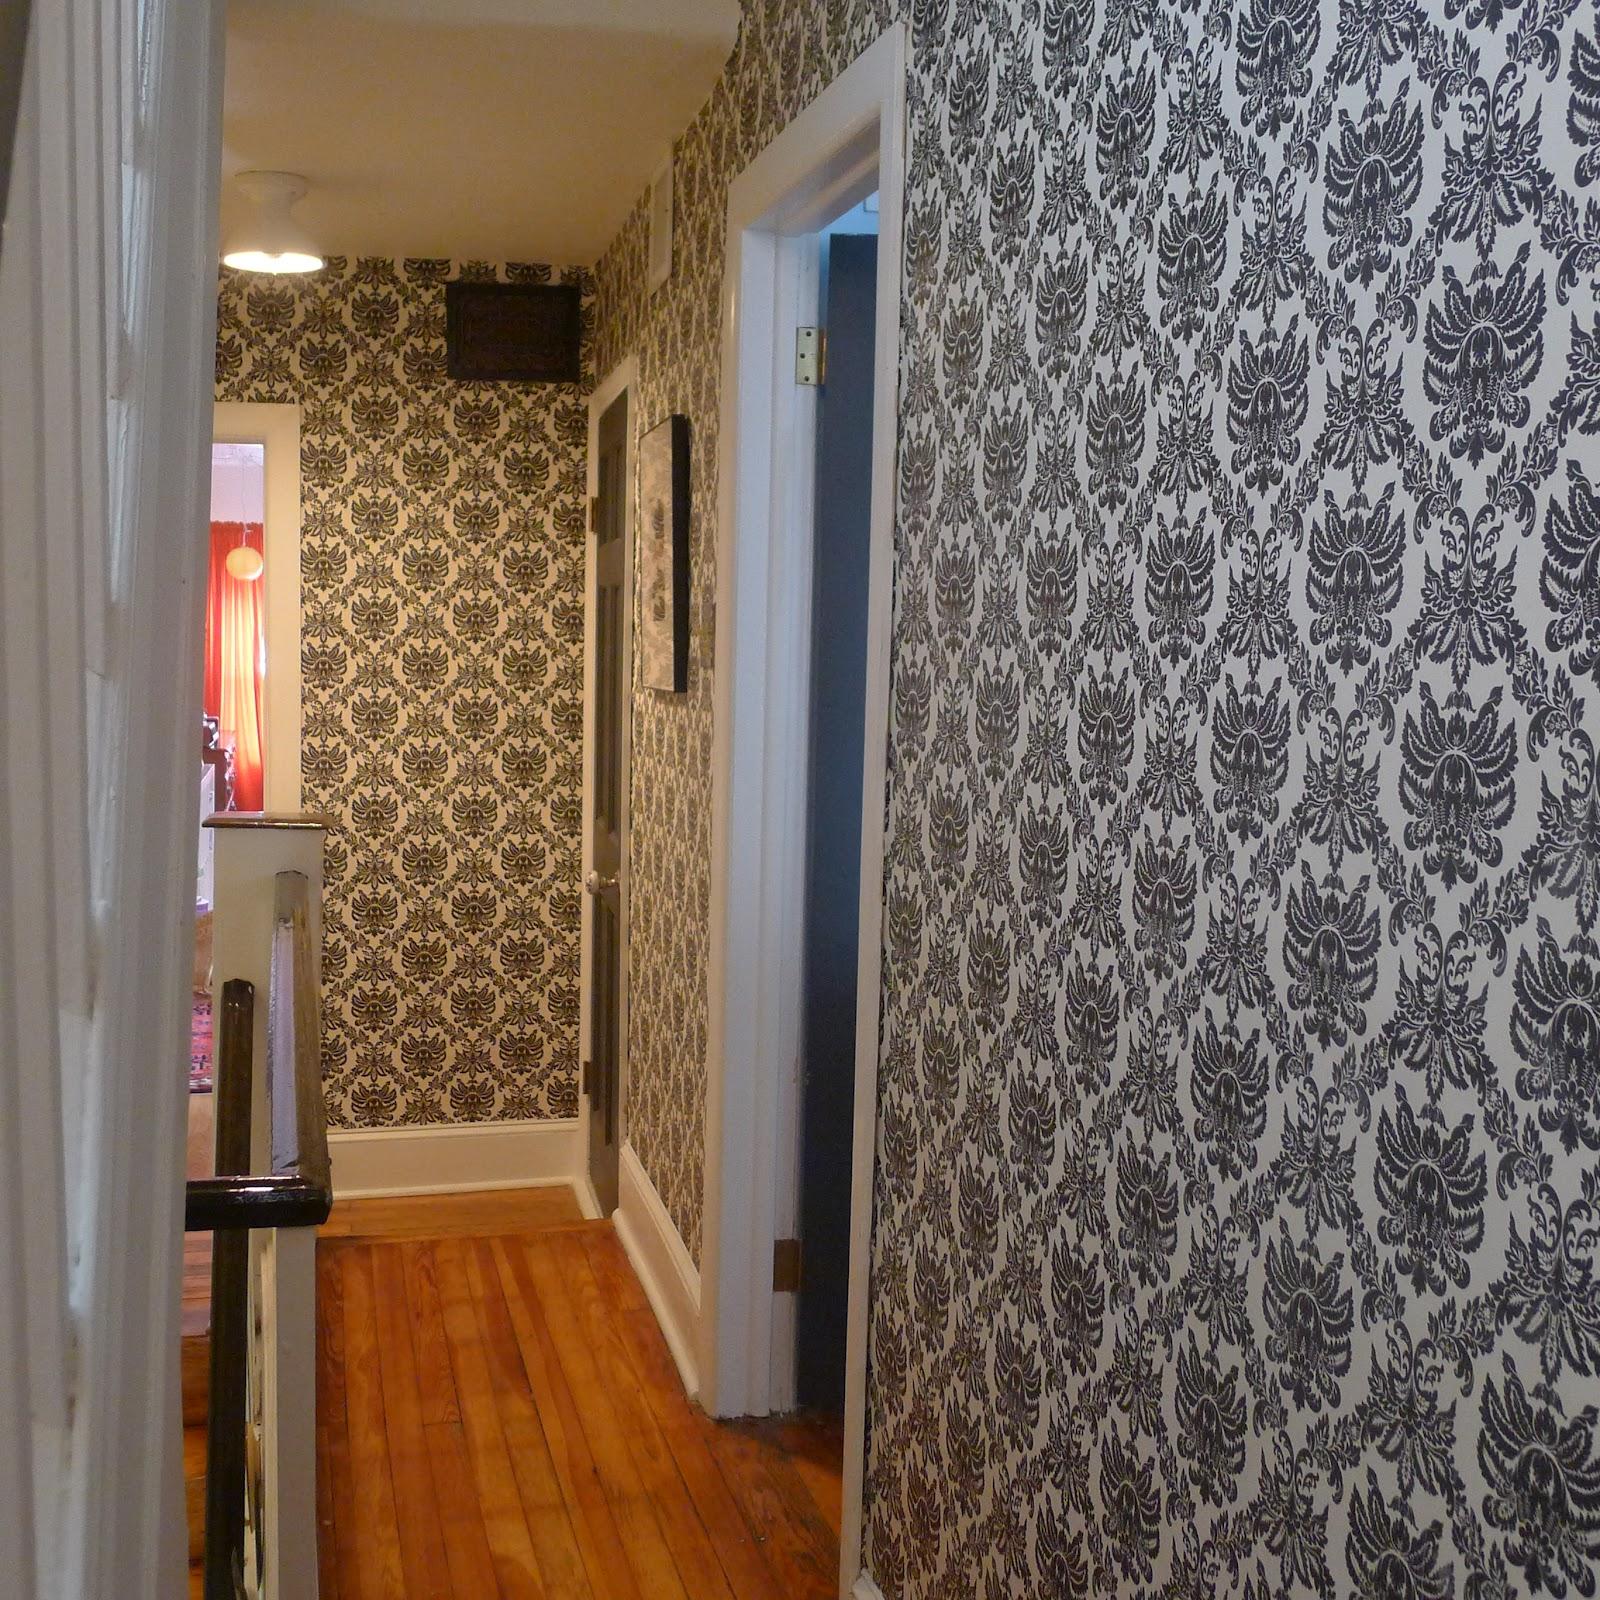 Hallway Wallpaper Ideas Home Decor and Interior Design 1600x1600